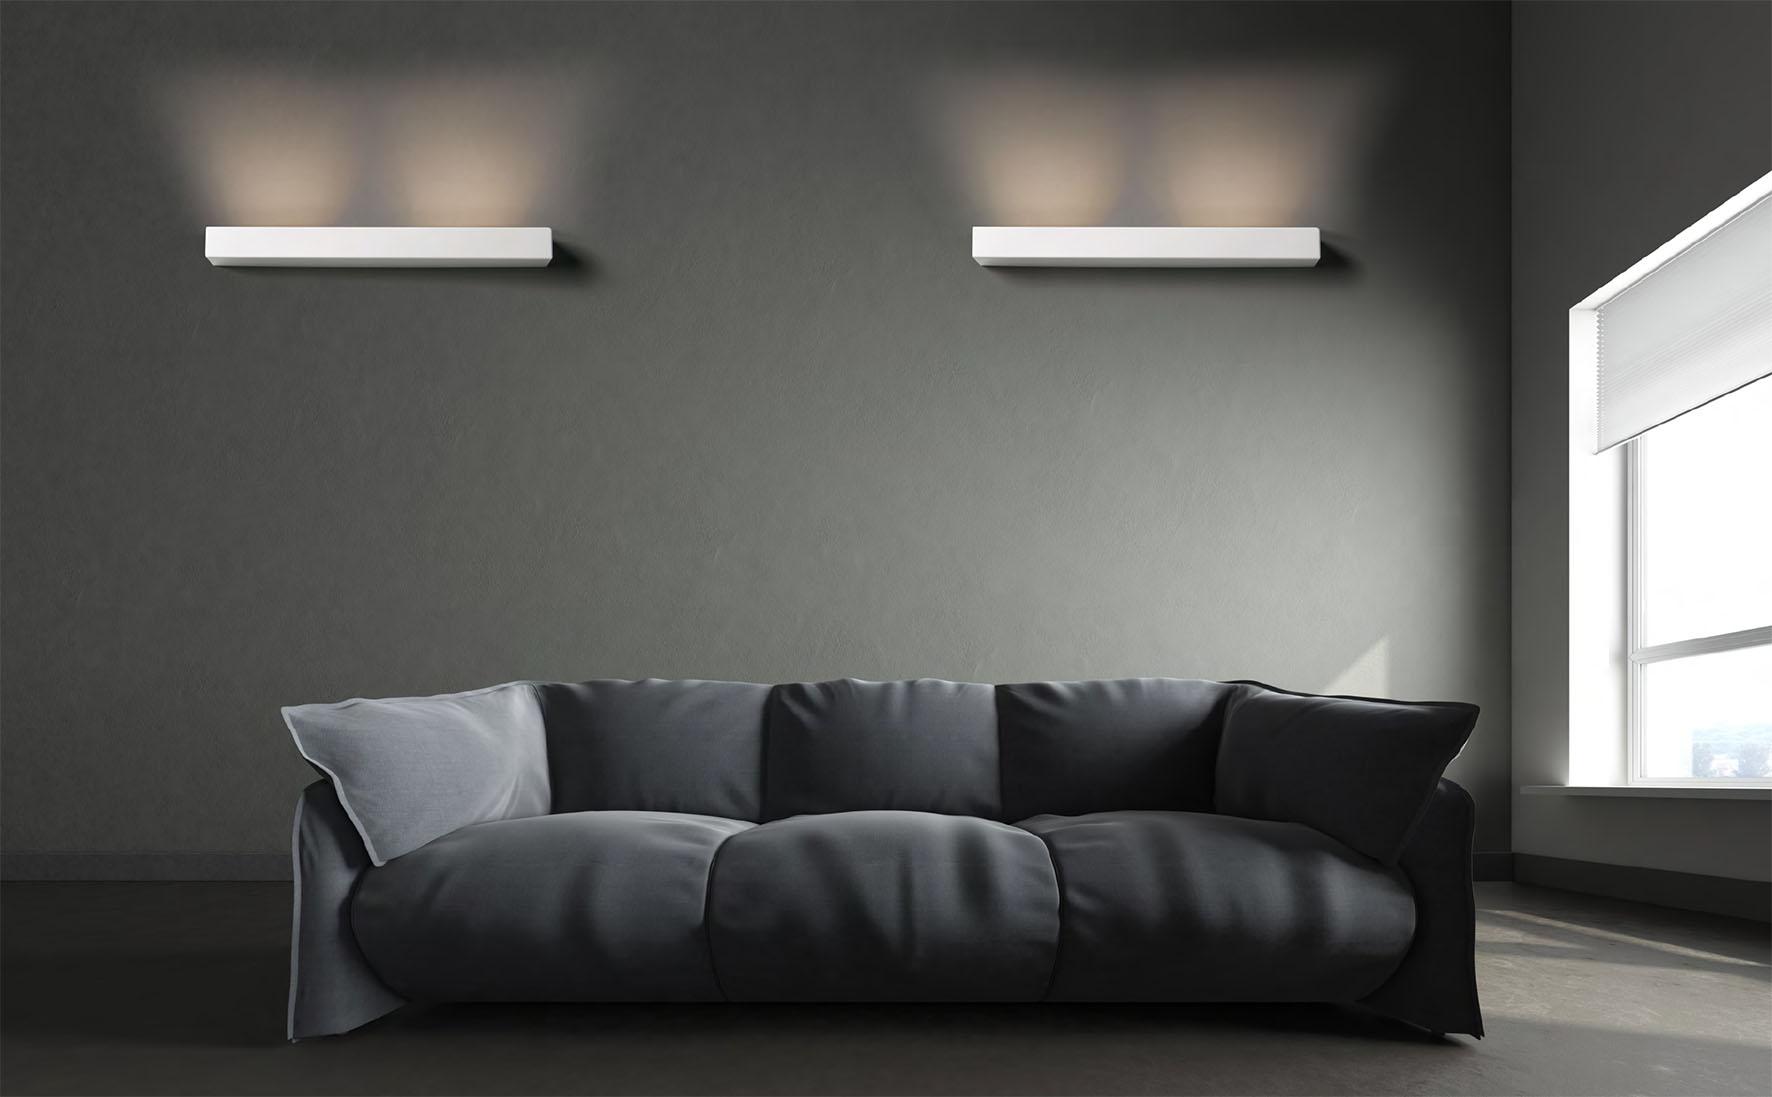 Sideform Lampada Da Parete TRATTO LED - Notali Lampadari